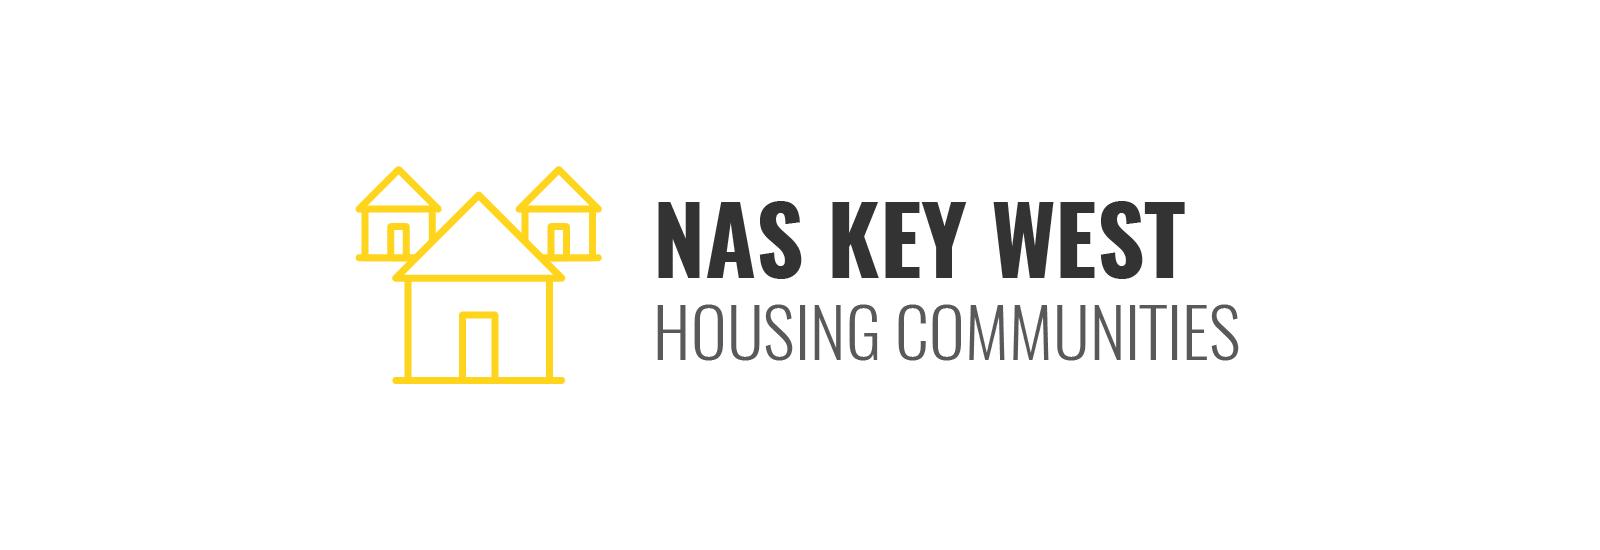 NAS Key West Housing Communities